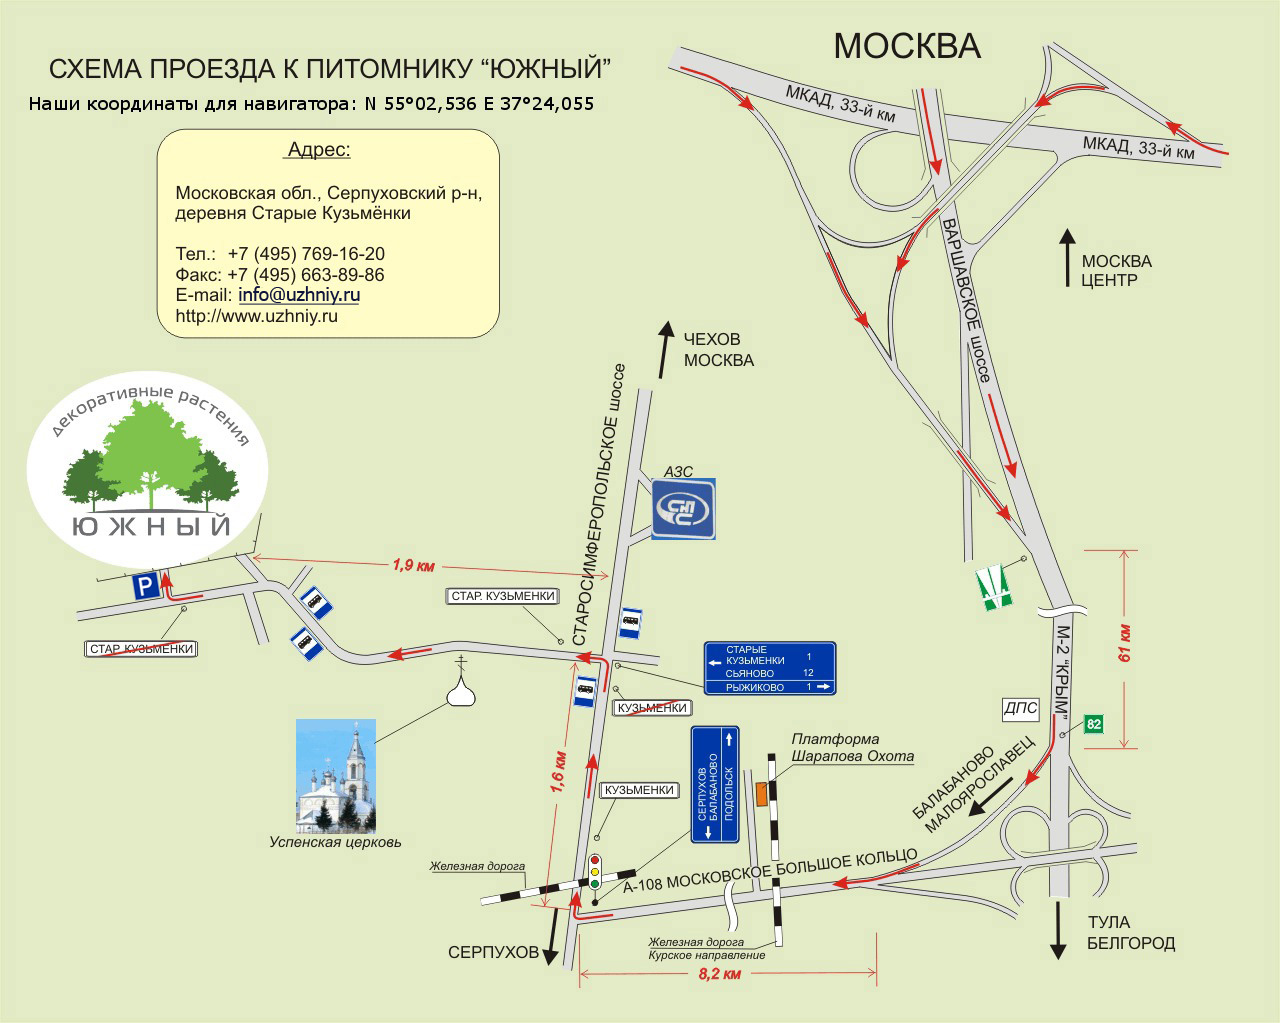 Схема проезда по территории